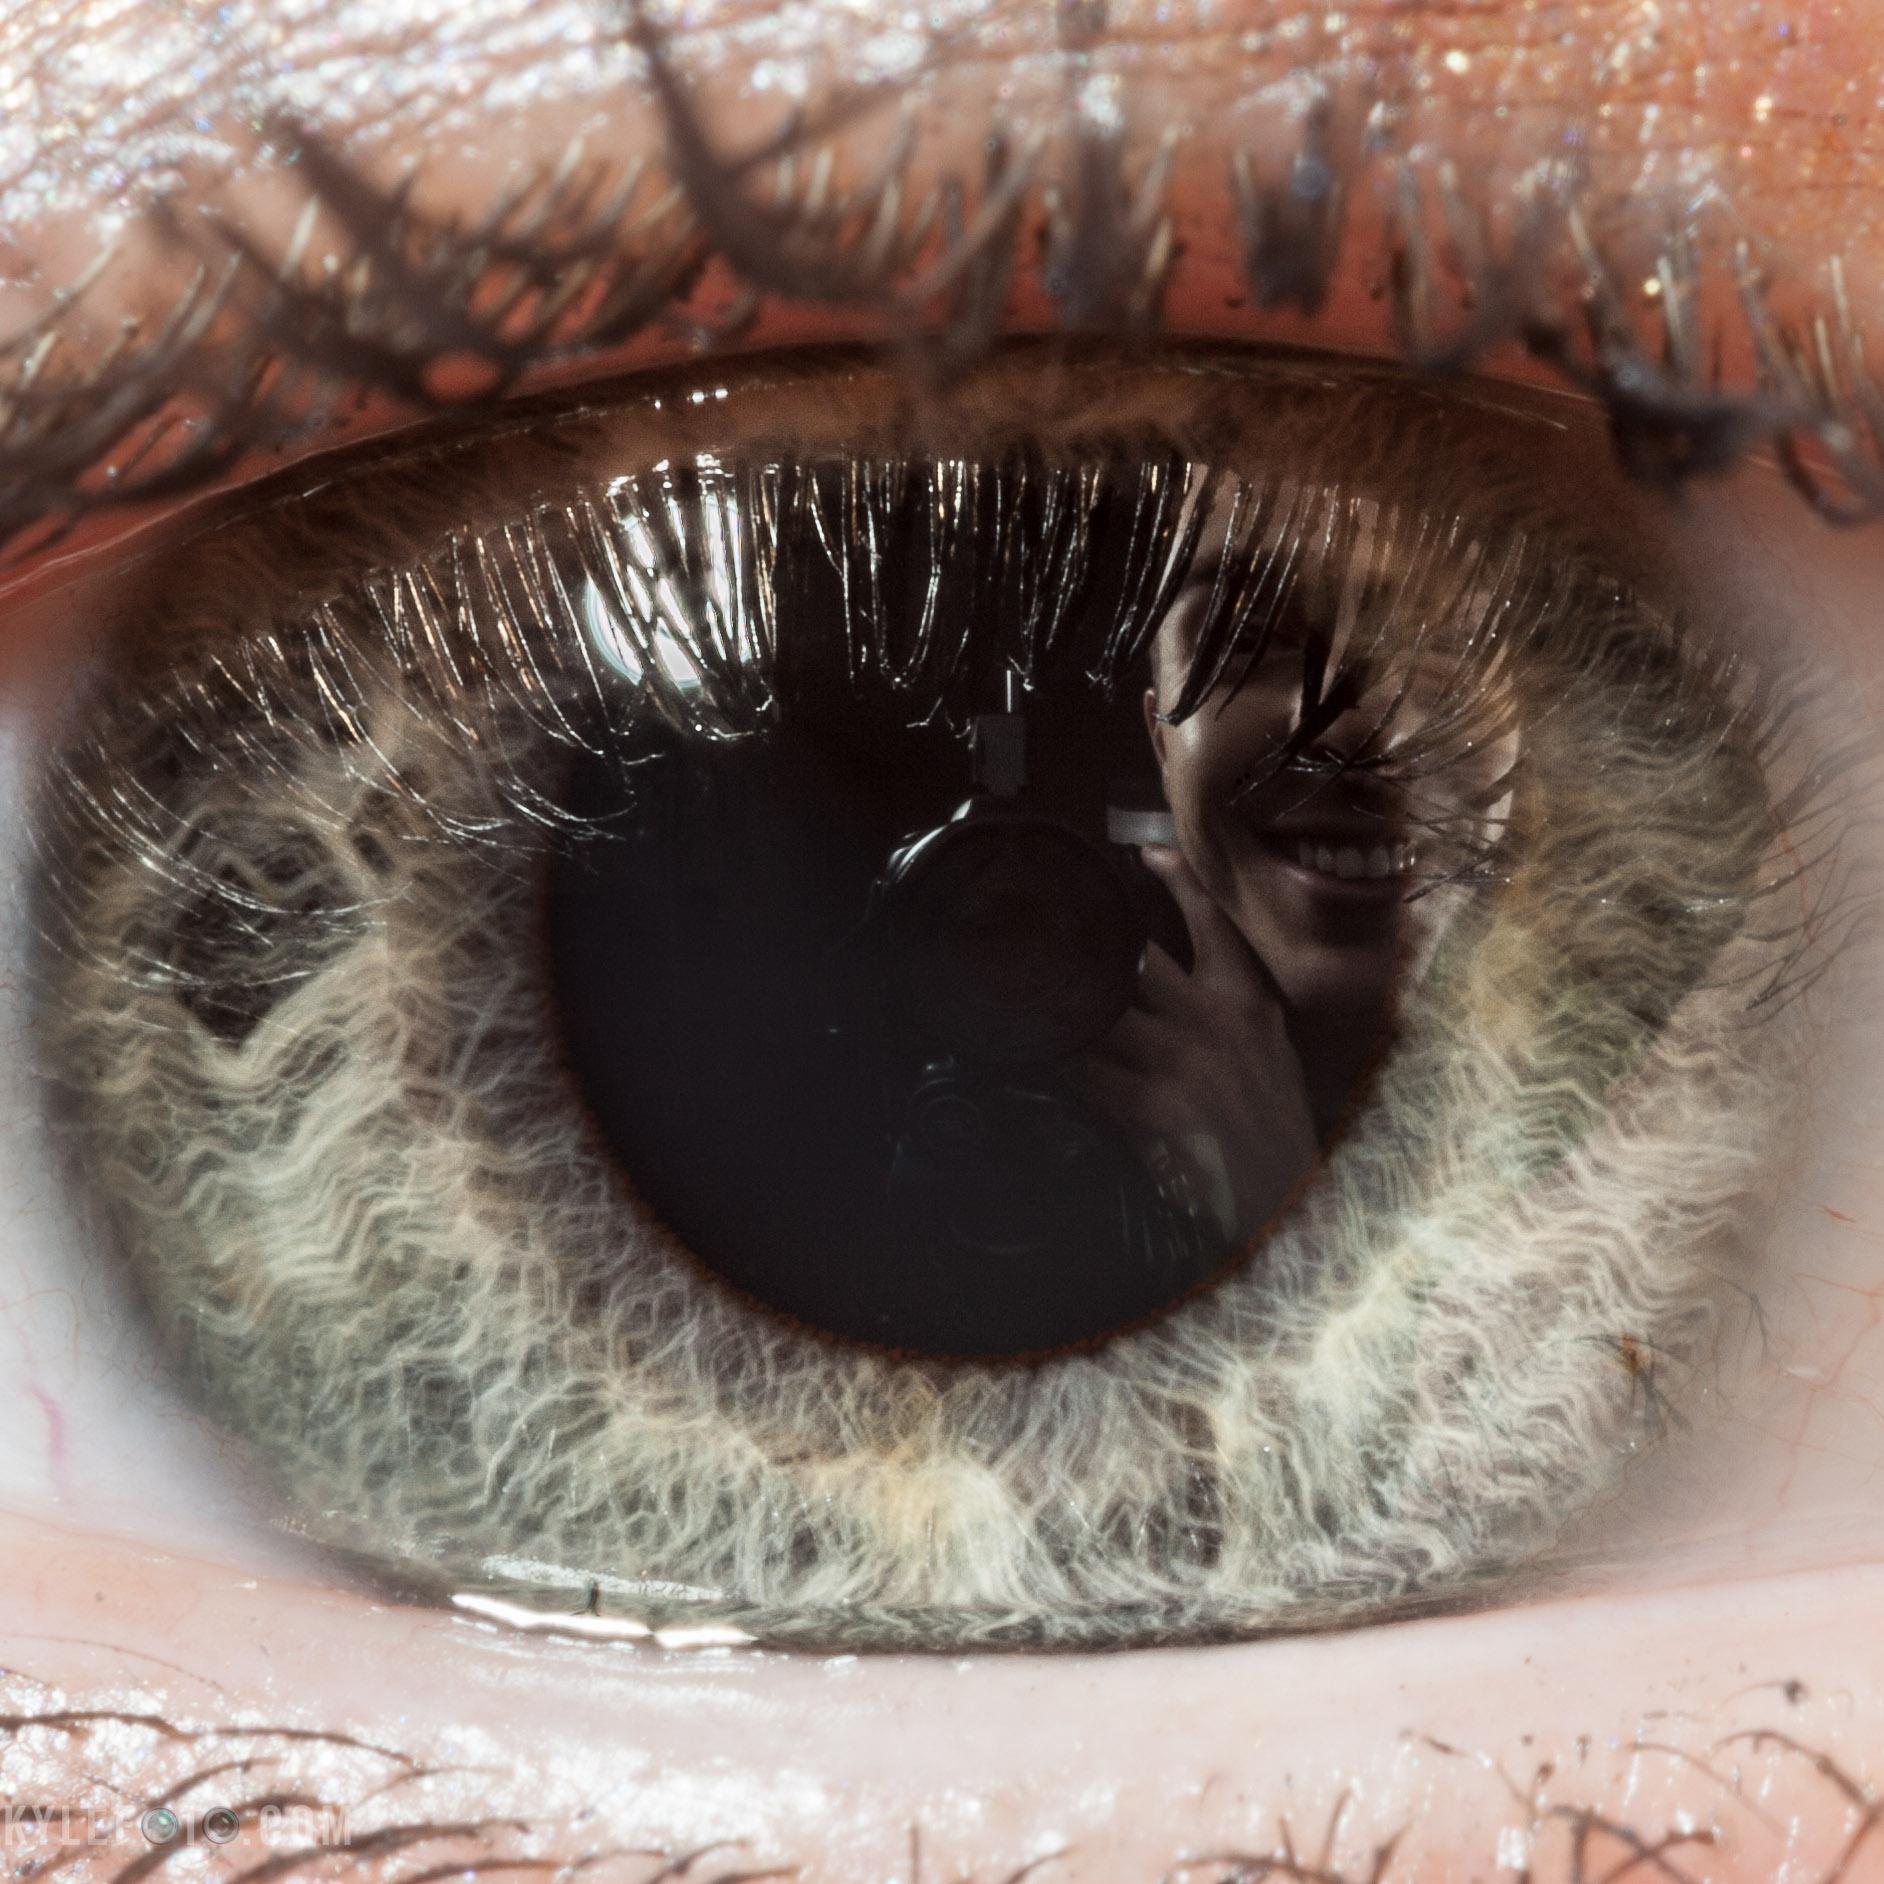 eyeball-1.jpg